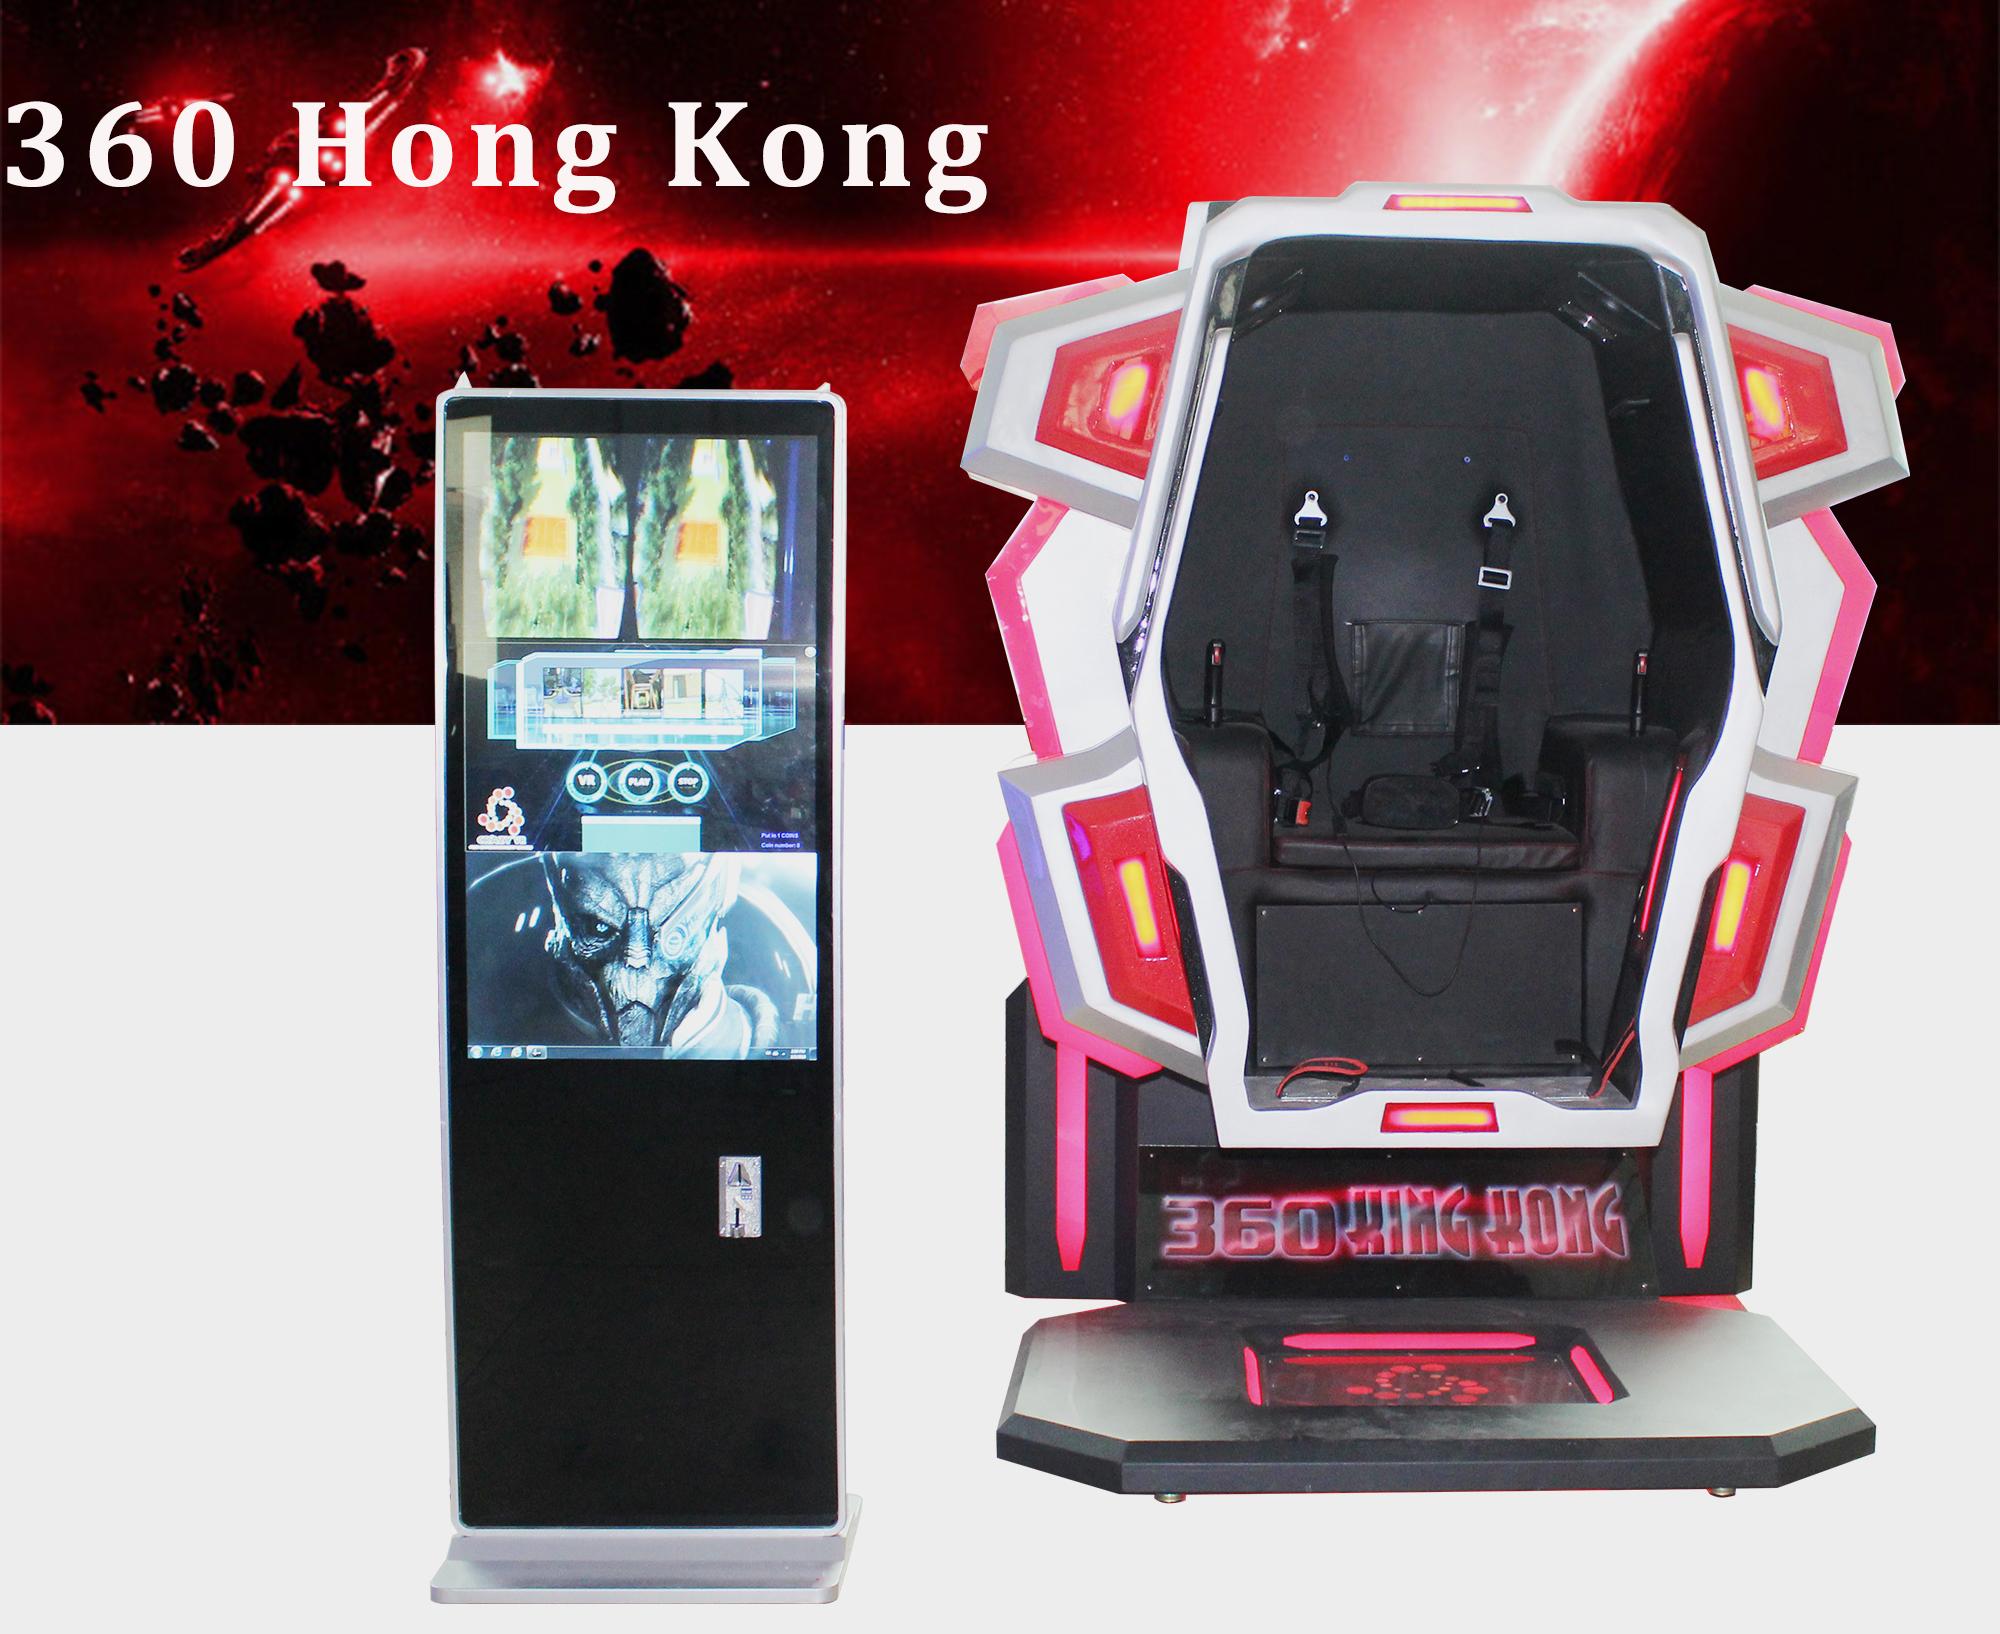 Omazing キングコング 9d vr ローラーコースター 360 vr 回転 vr シネマシミュレータ販売のため